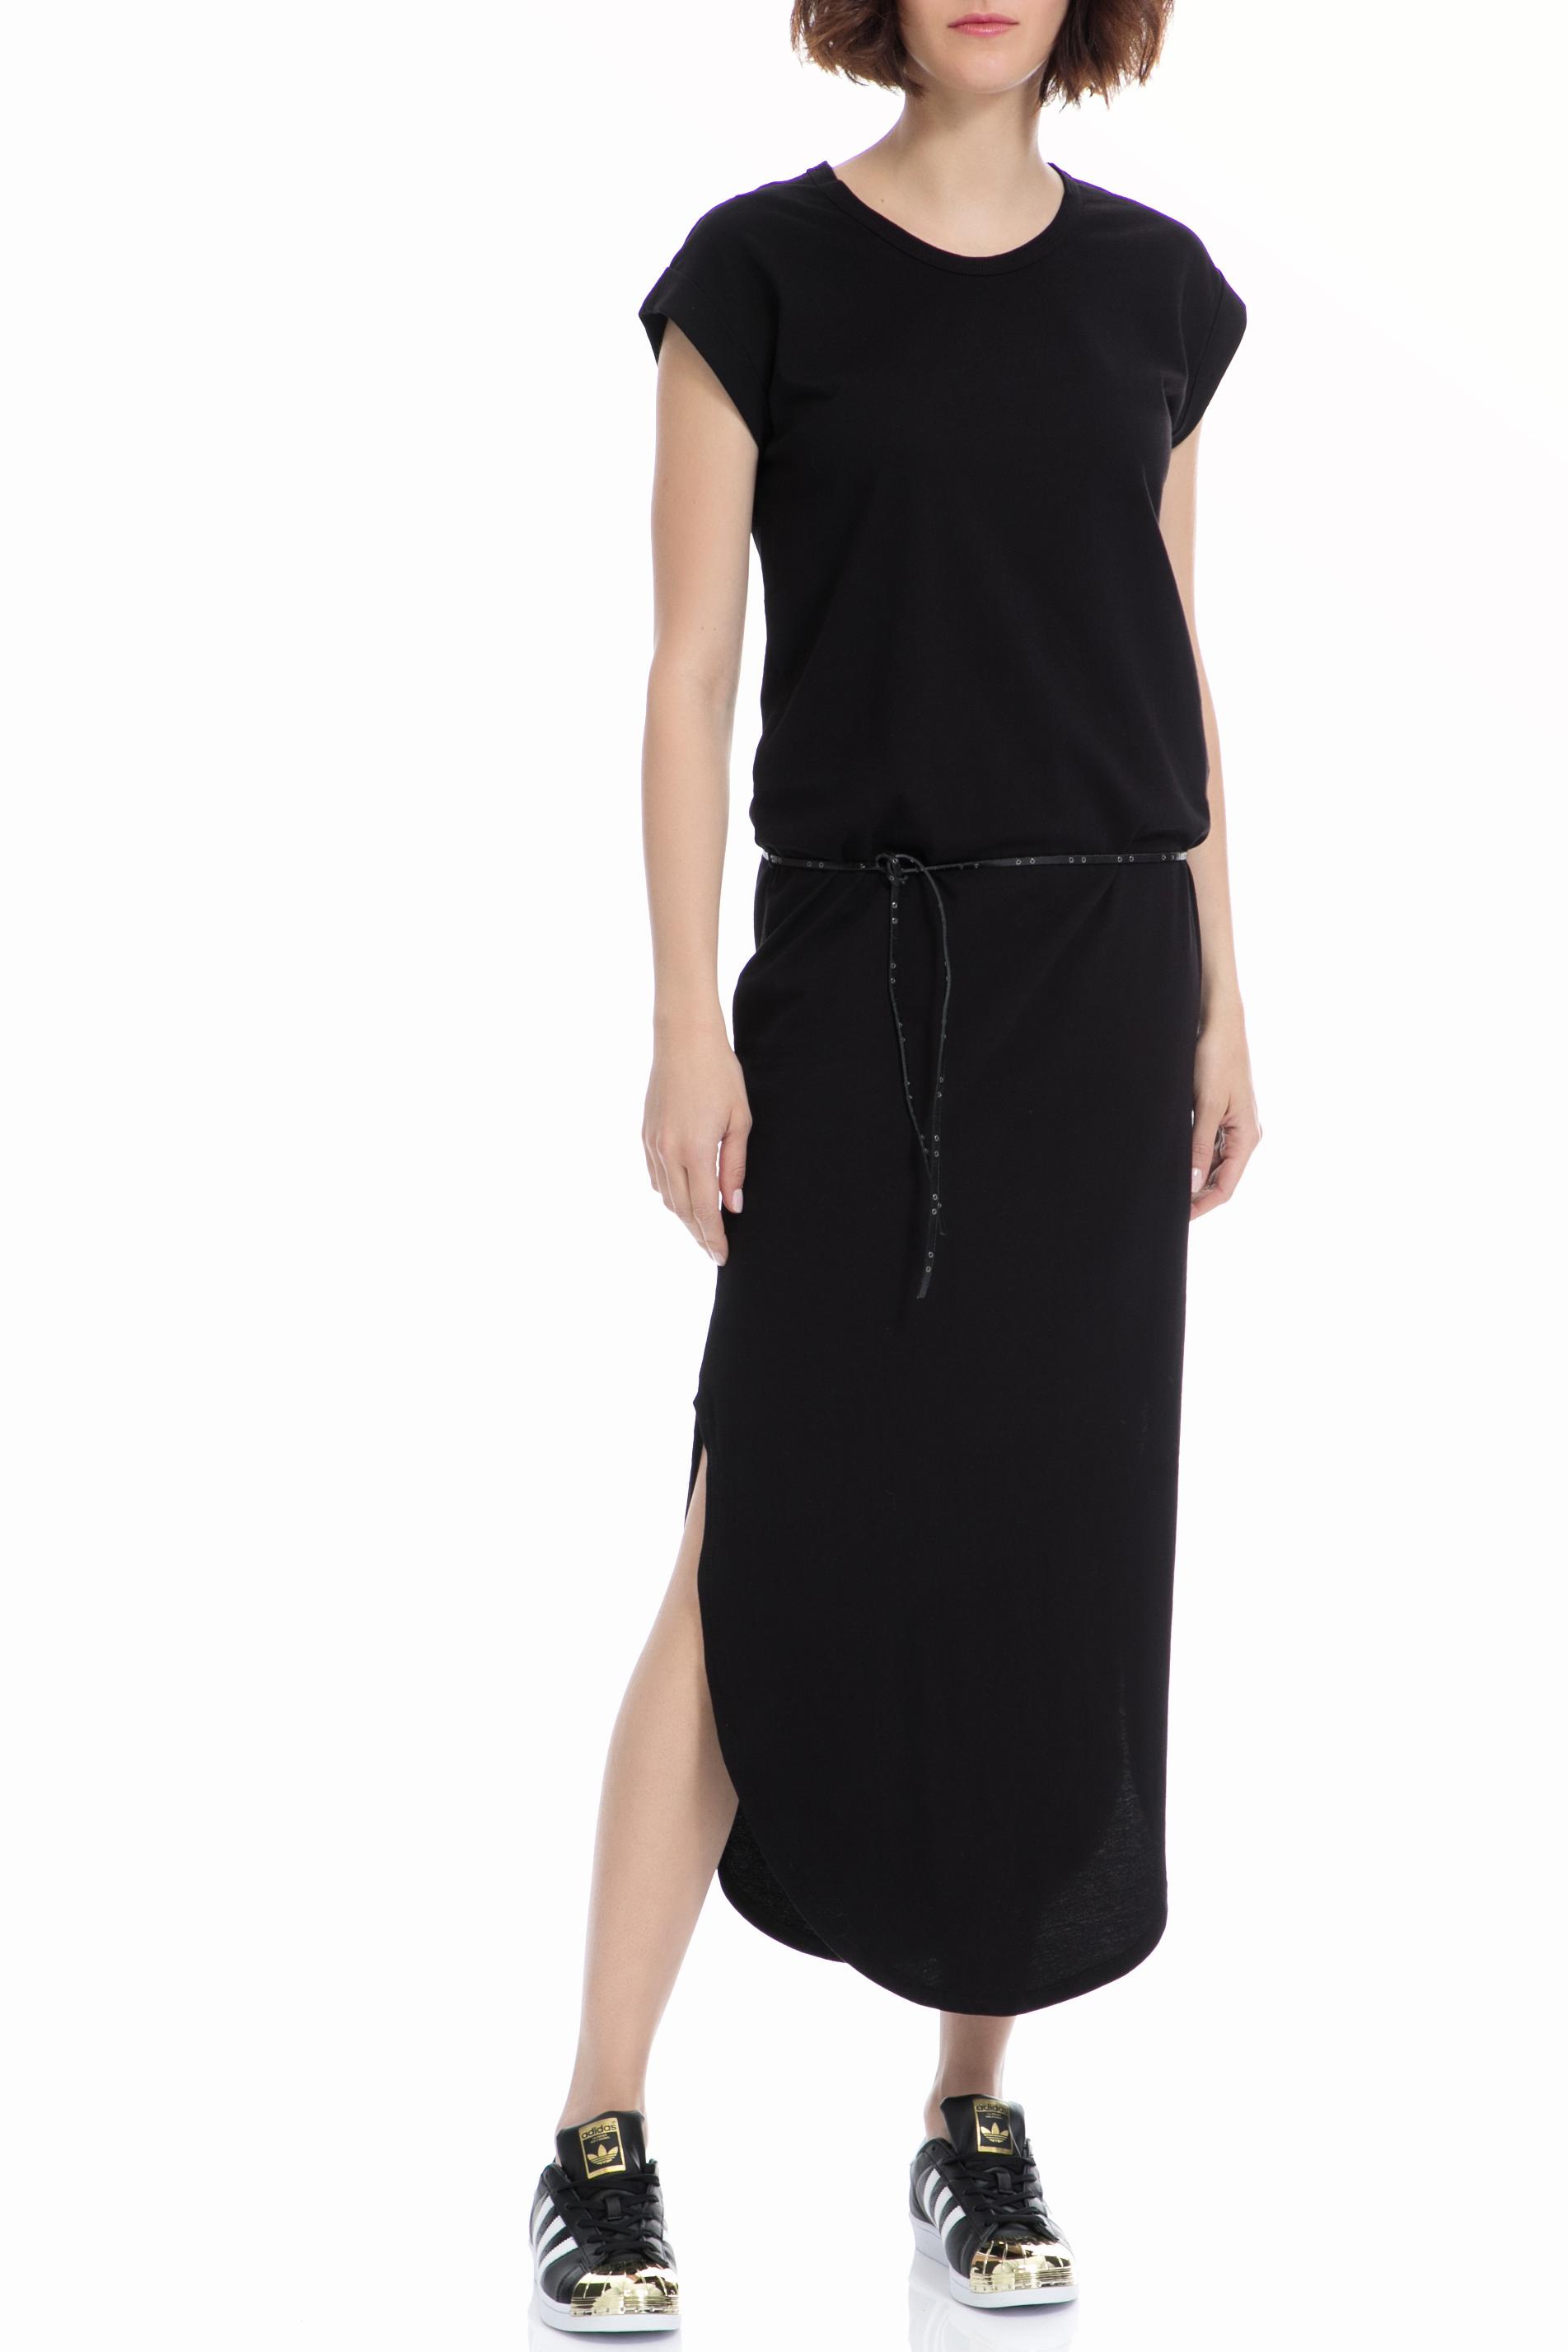 SCOTCH & SODA - Φόρεμα Maison Scotch μαύρο γυναικεία ρούχα φορέματα μάξι